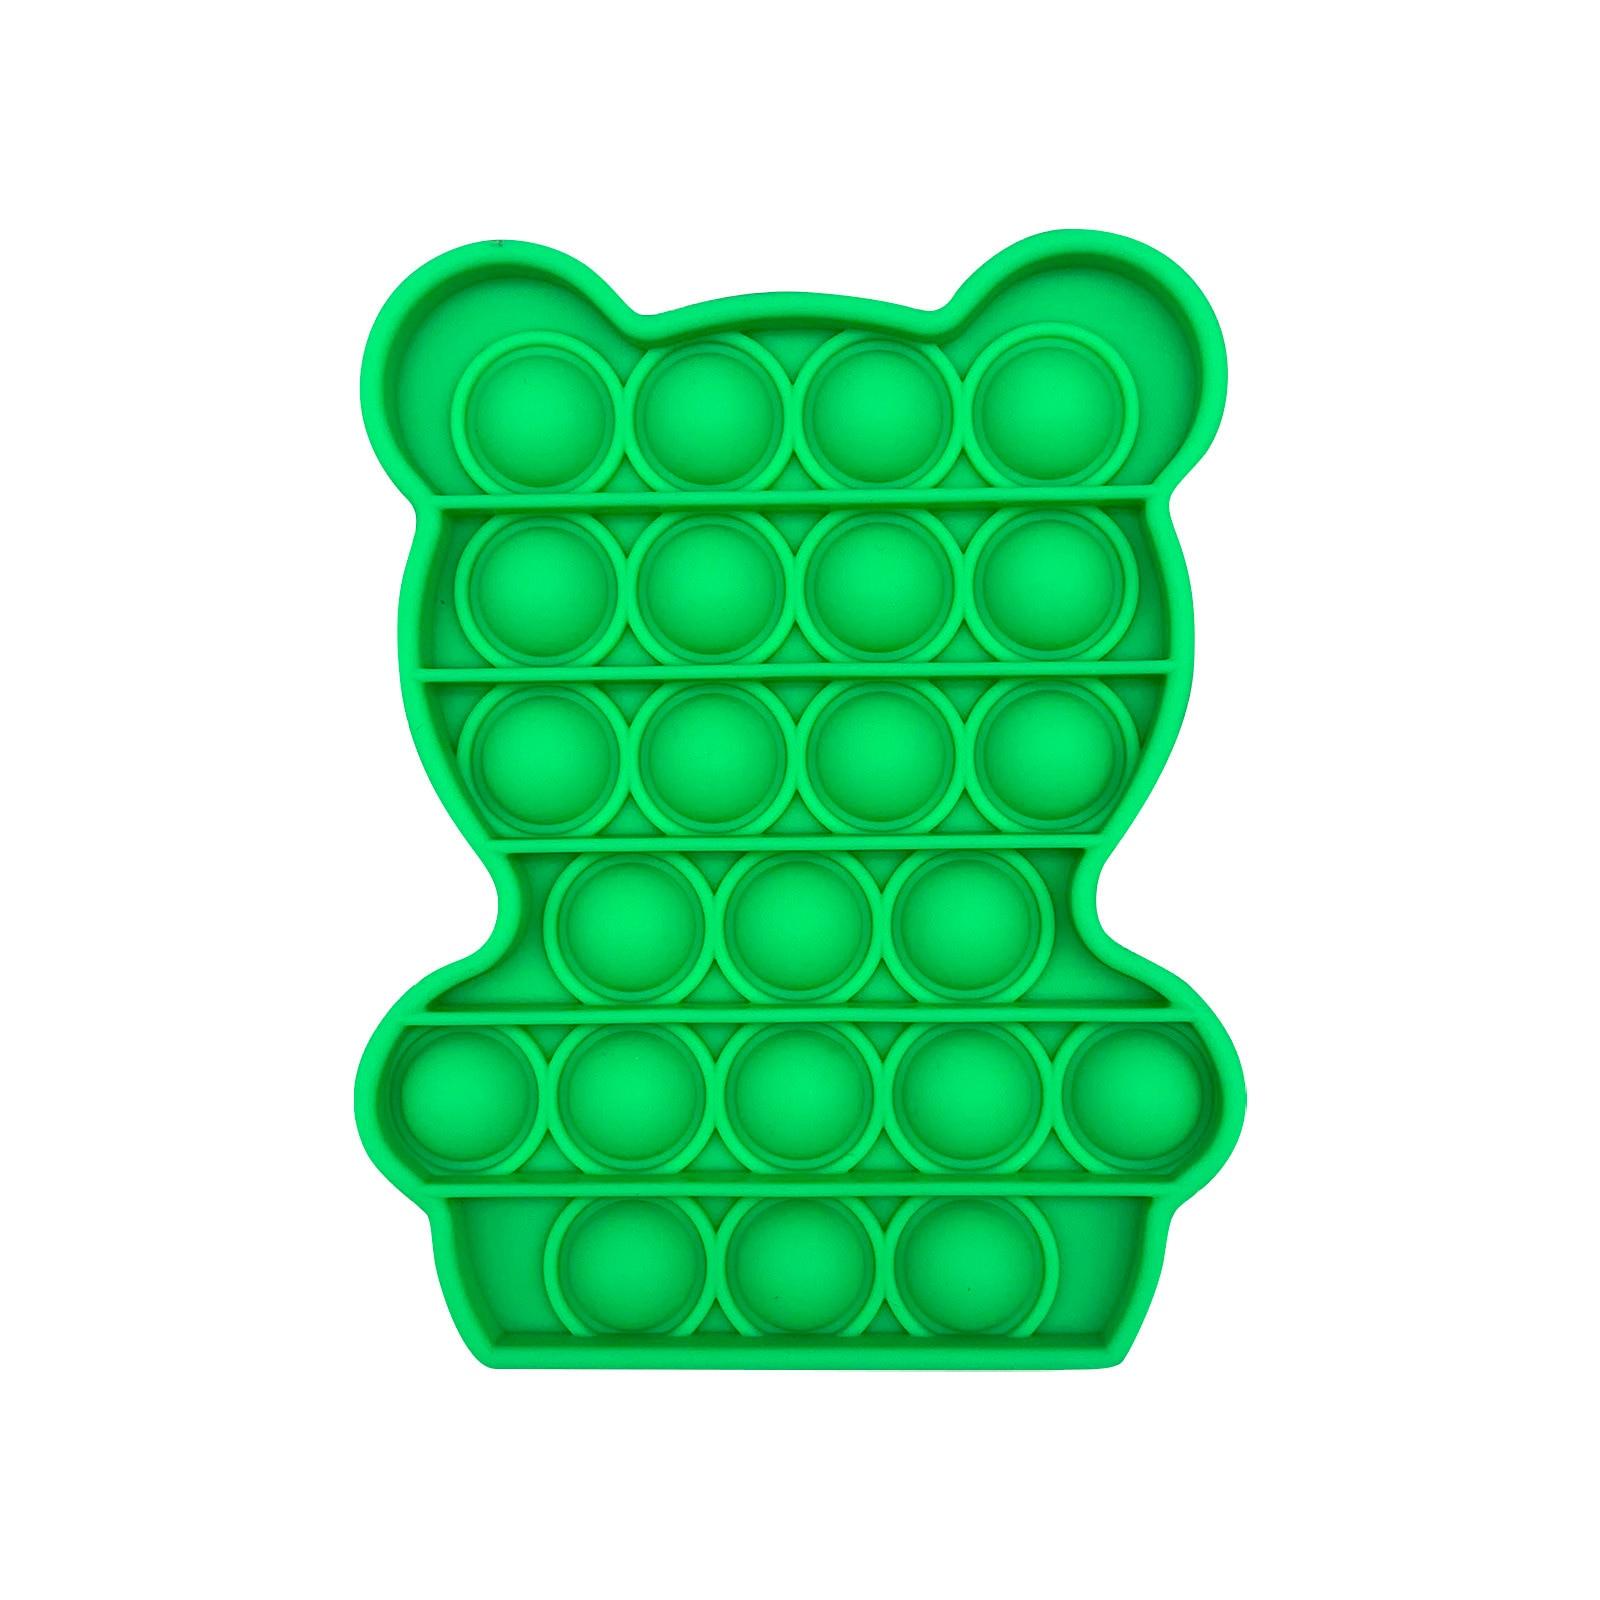 Toys Adult Needs Pops-It-Fidget Anti-Stress Push-Pops Bubble-Sensory-Toy Funny Squishy img3